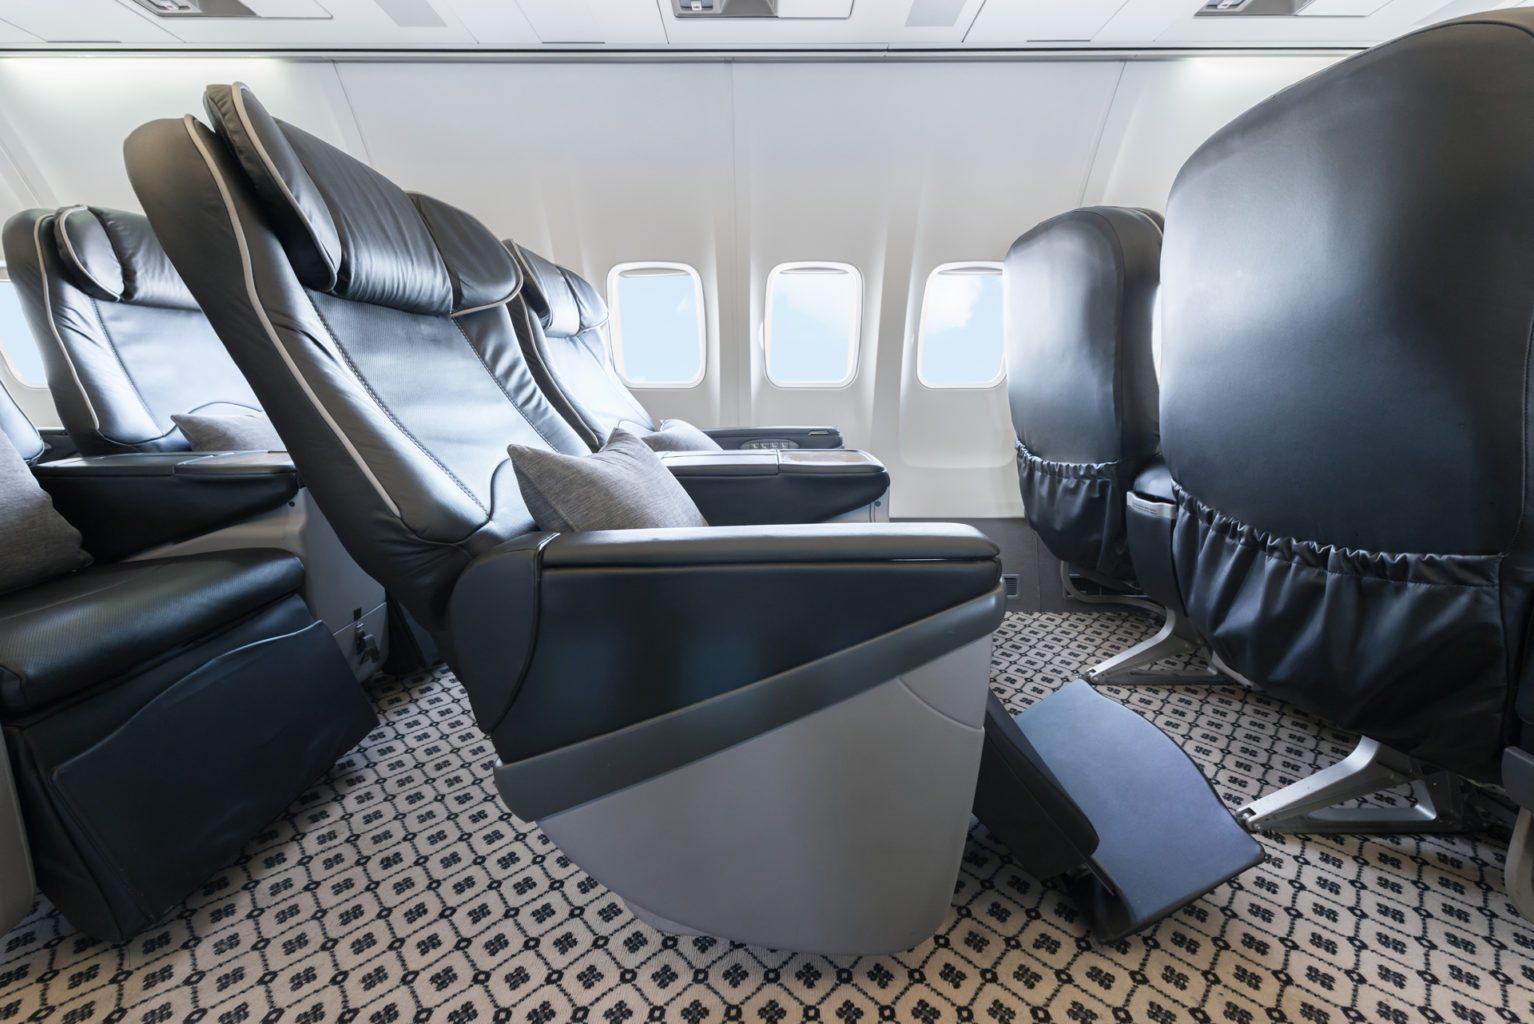 Aircraft seats pre-season travel